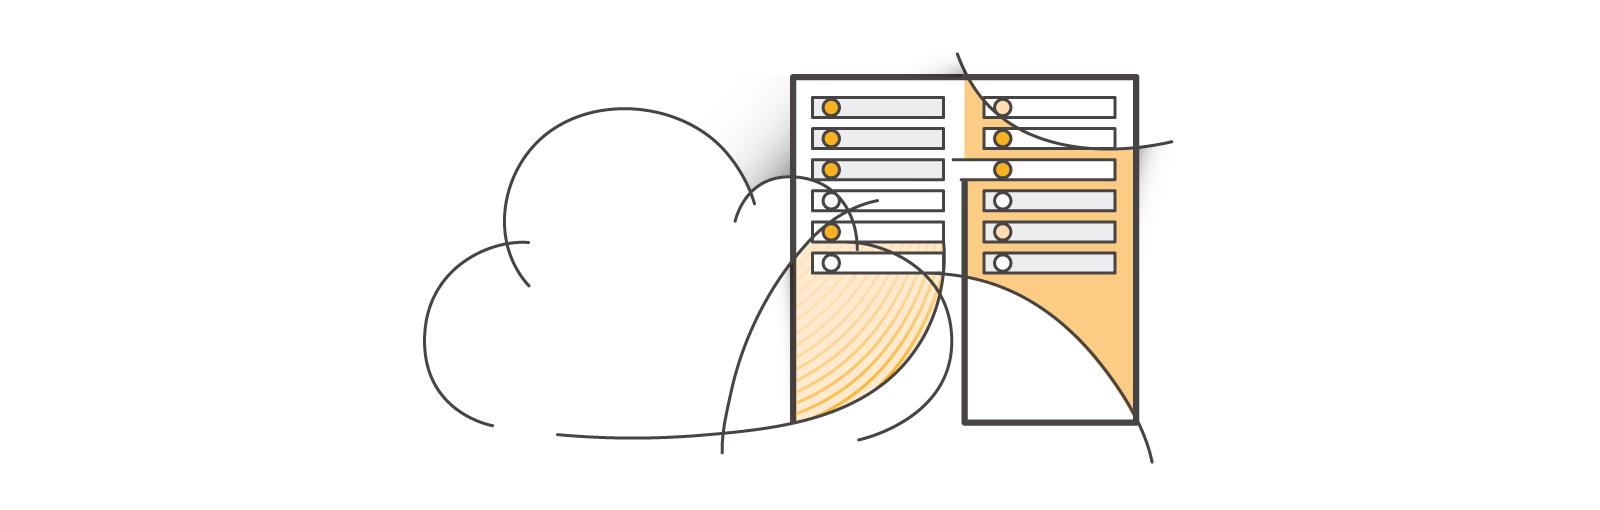 Hybrid Cloud Architectures - Amazon Web Services (AWS)